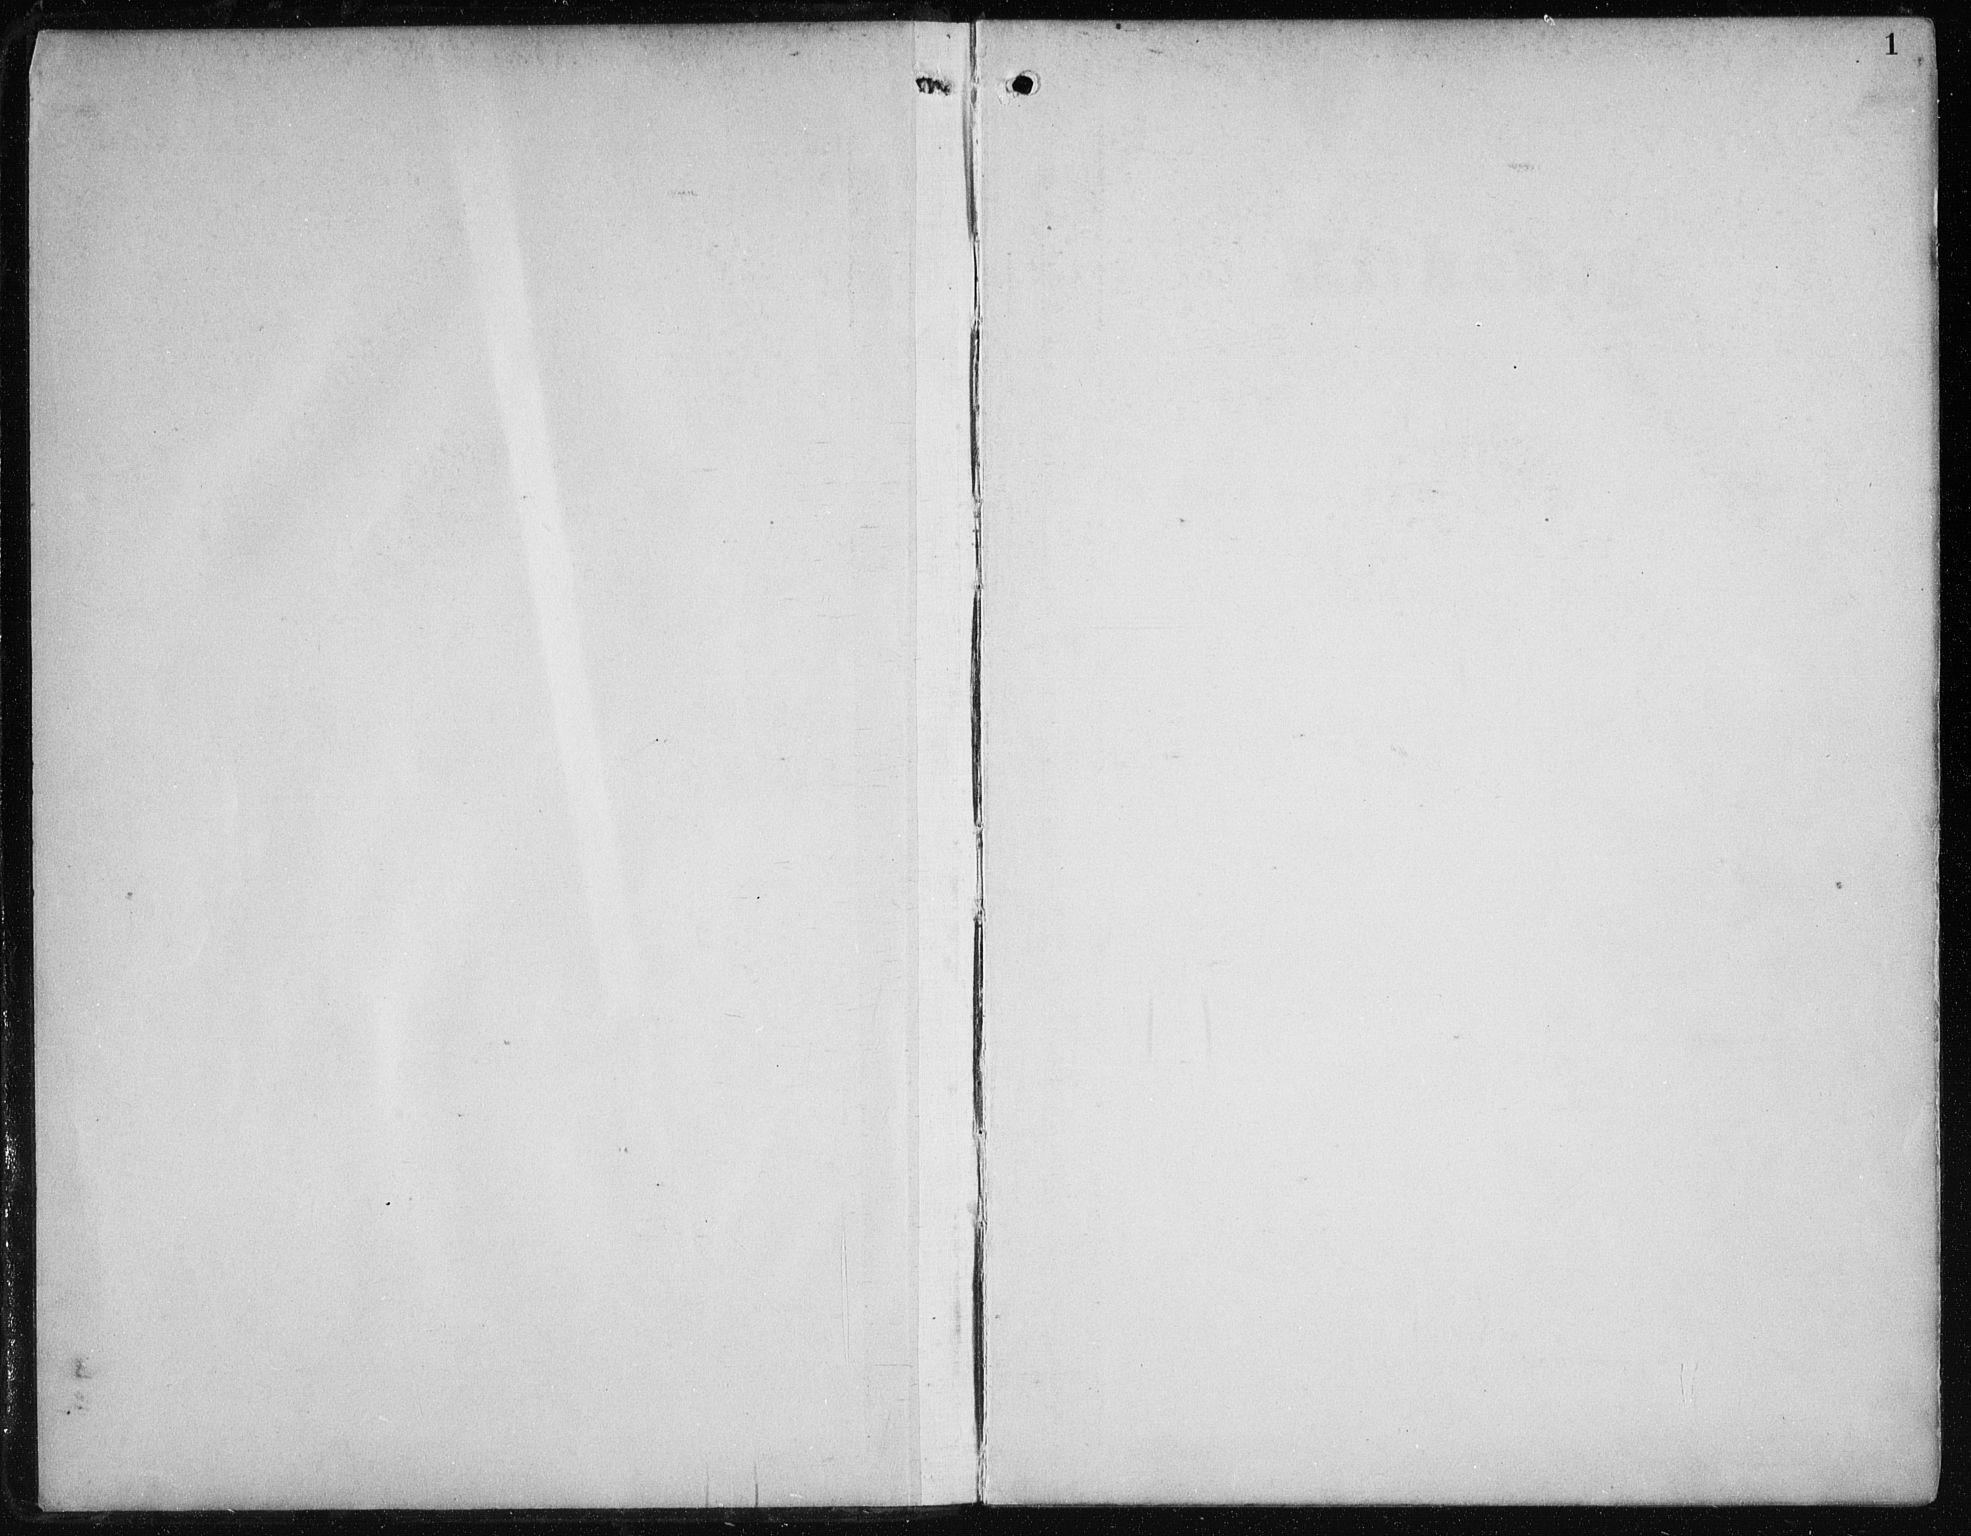 SAB, Fana Sokneprestembete, H/Haa/Haai/L0003: Ministerialbok nr. I 3, 1900-1912, s. 1